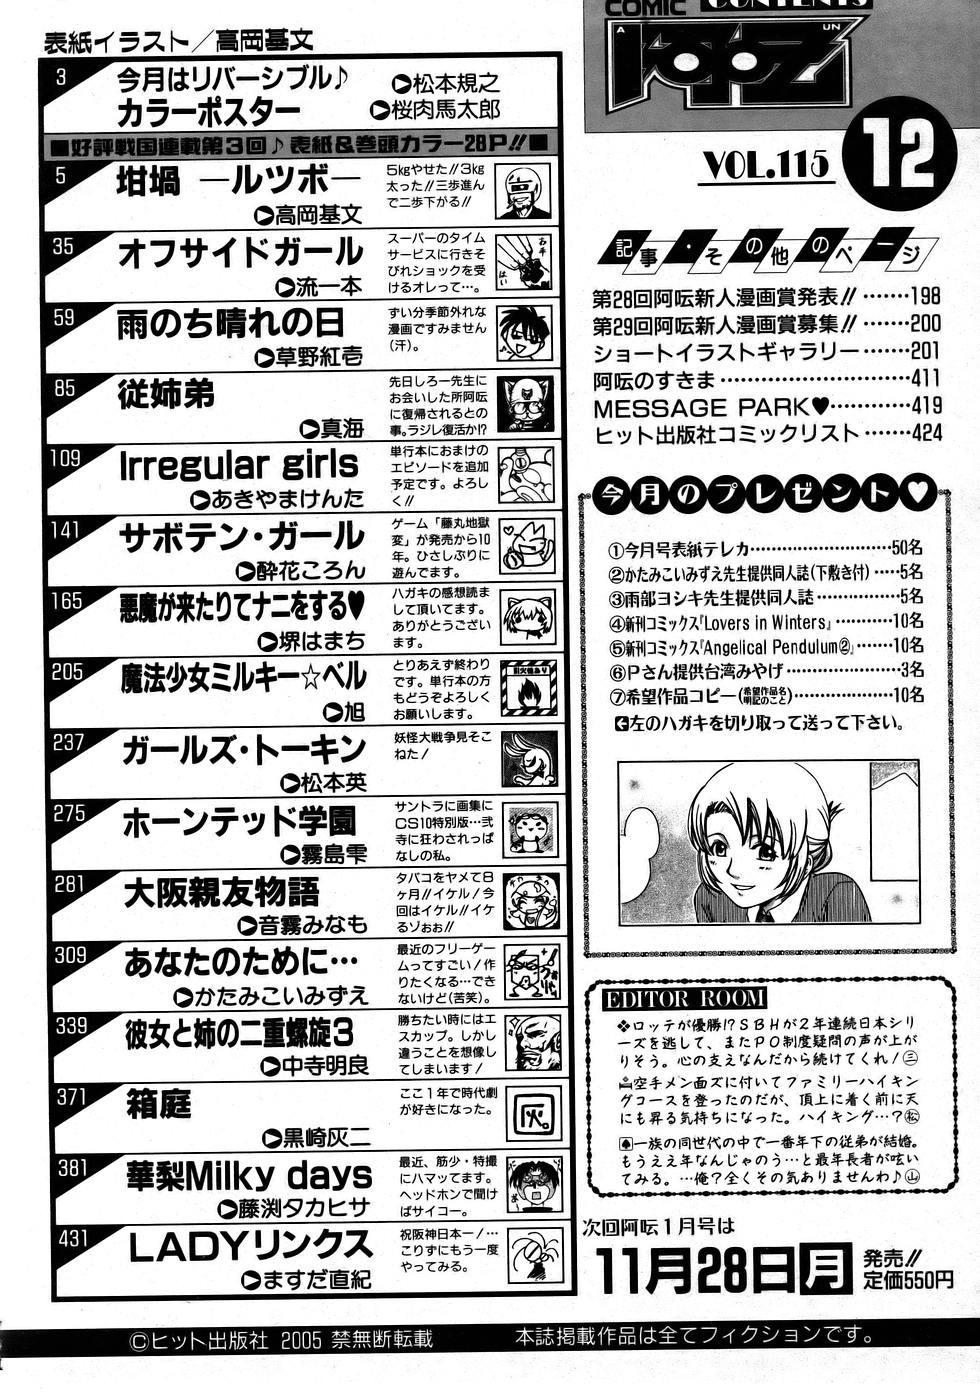 COMIC AUN 2005-12 Vol. 115 406